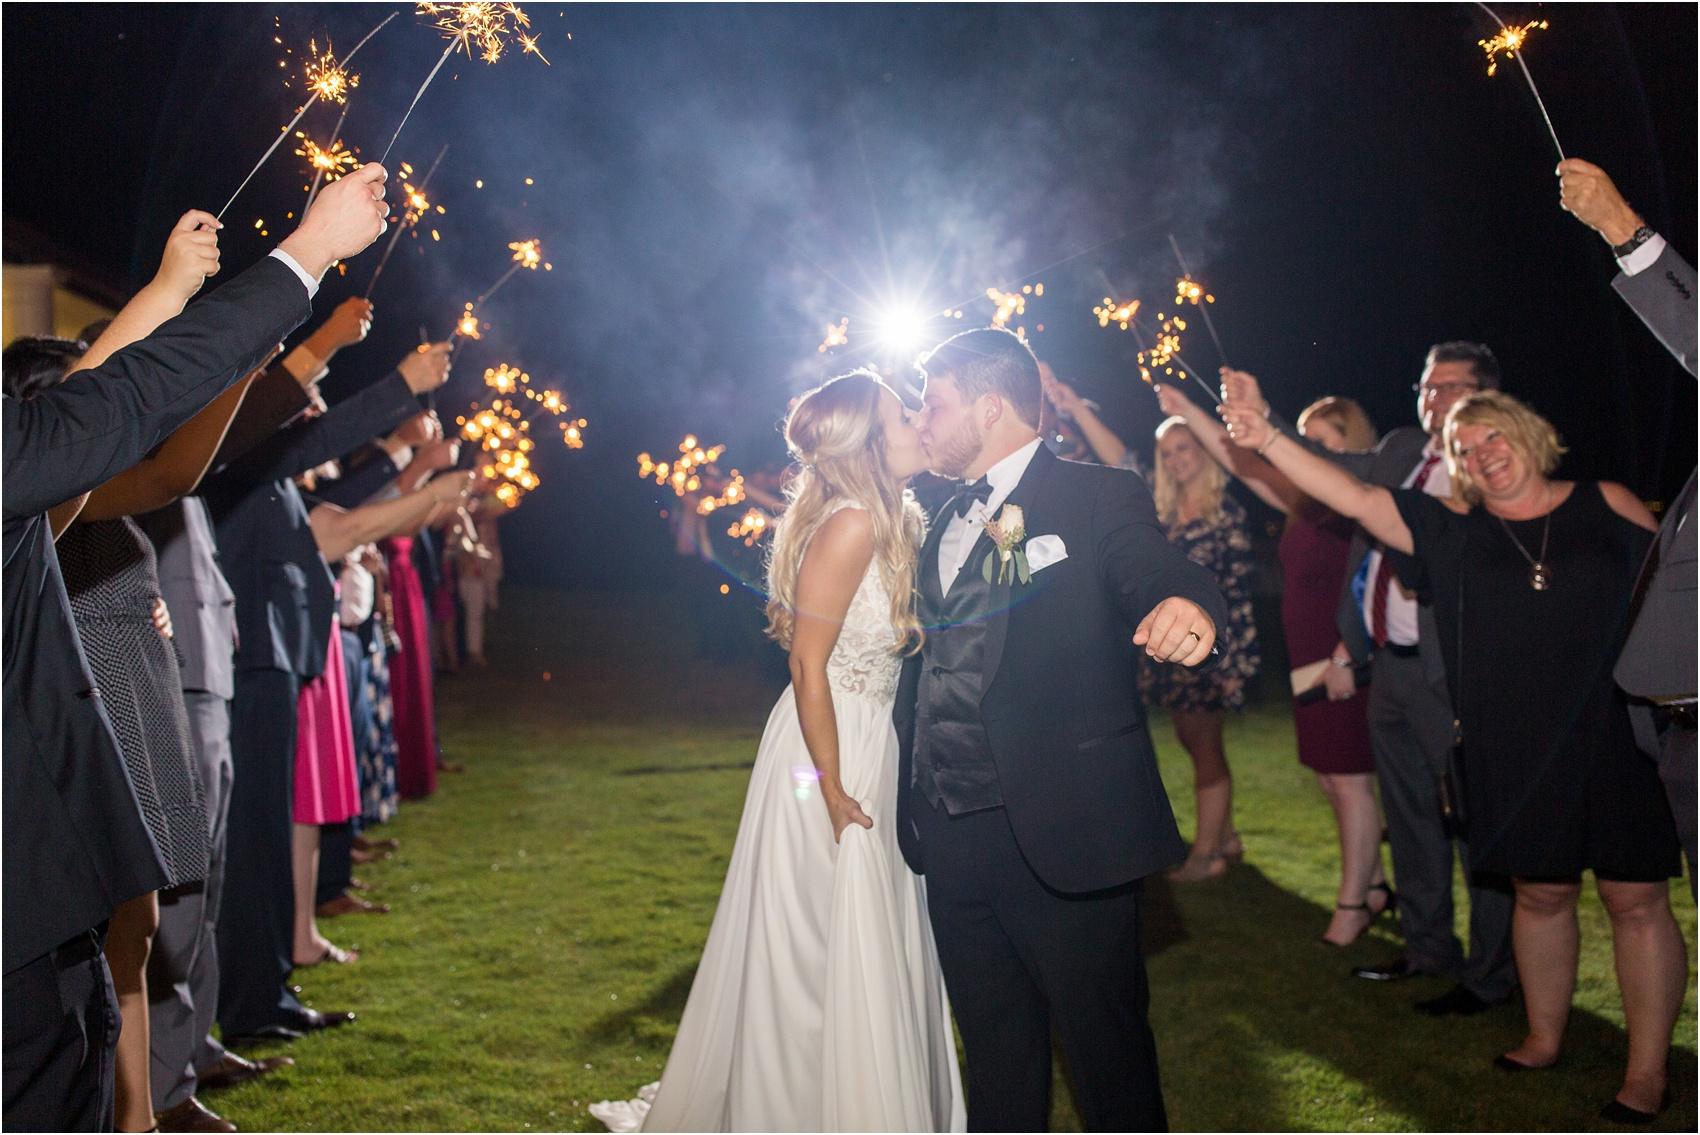 Savannah Eve Photography- Jurek-Woodworth Wedding- Sneak Peek-123.jpg